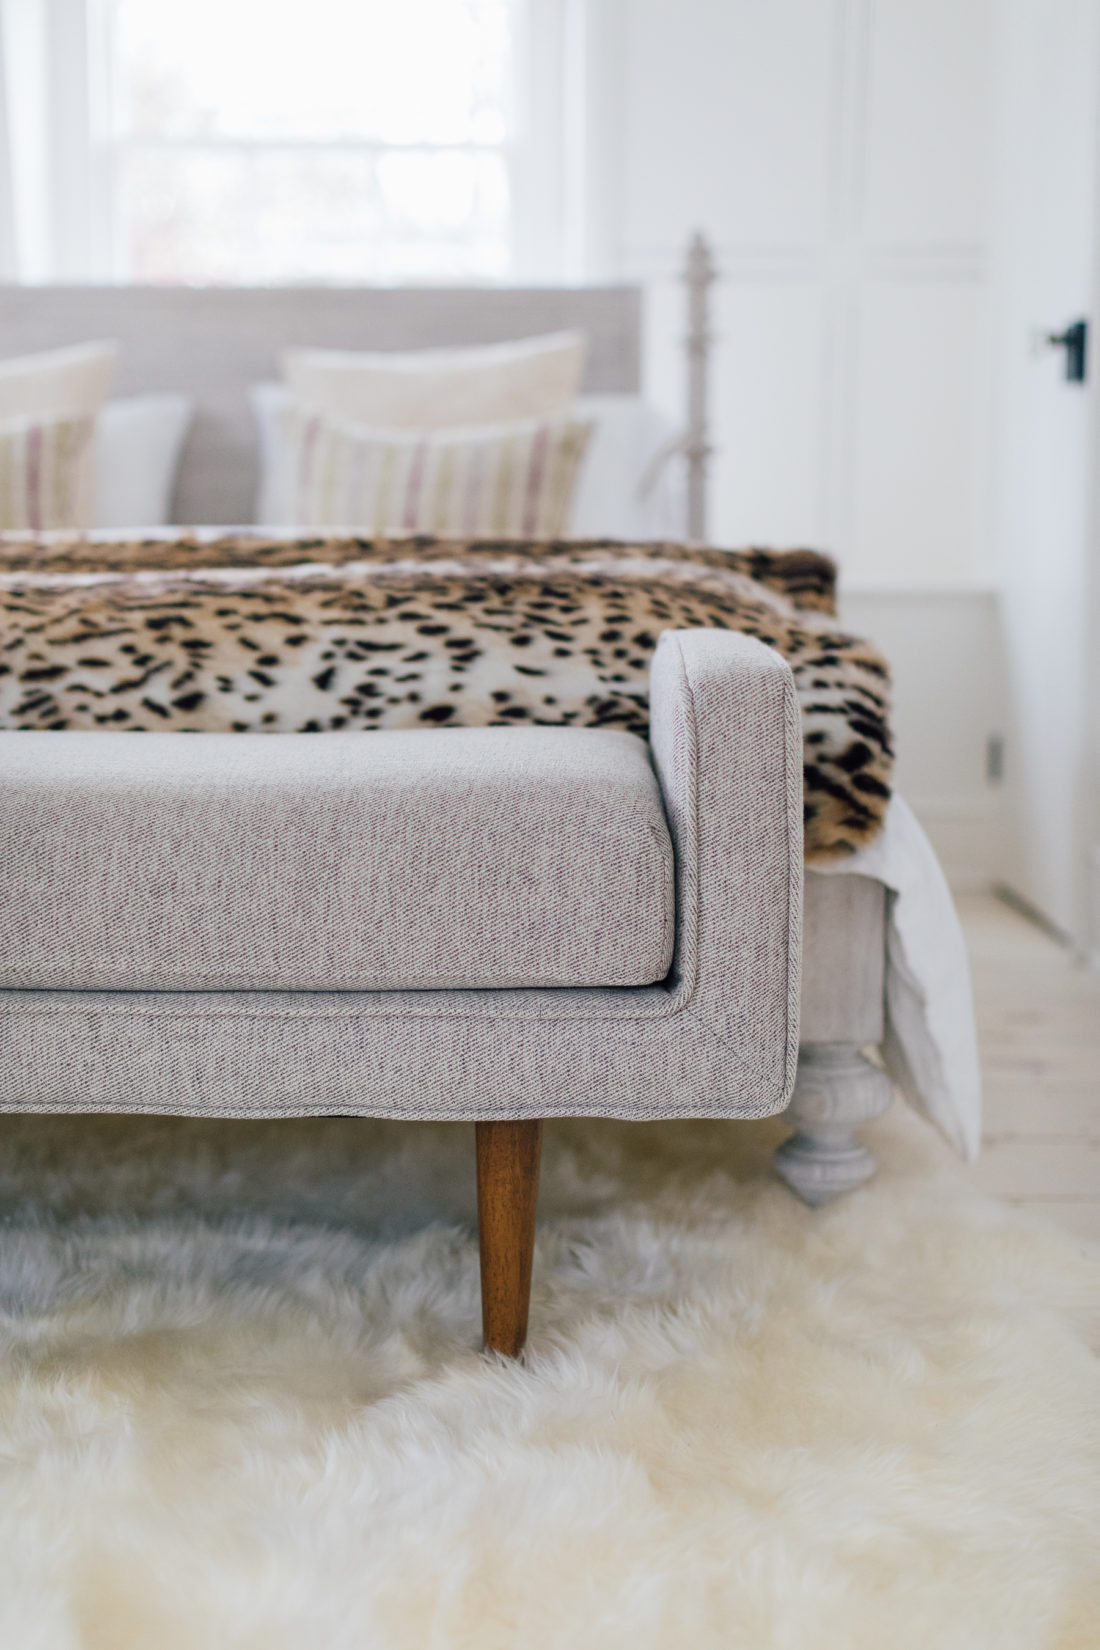 Details inside Eva Amurri's newly finished Guest Suite